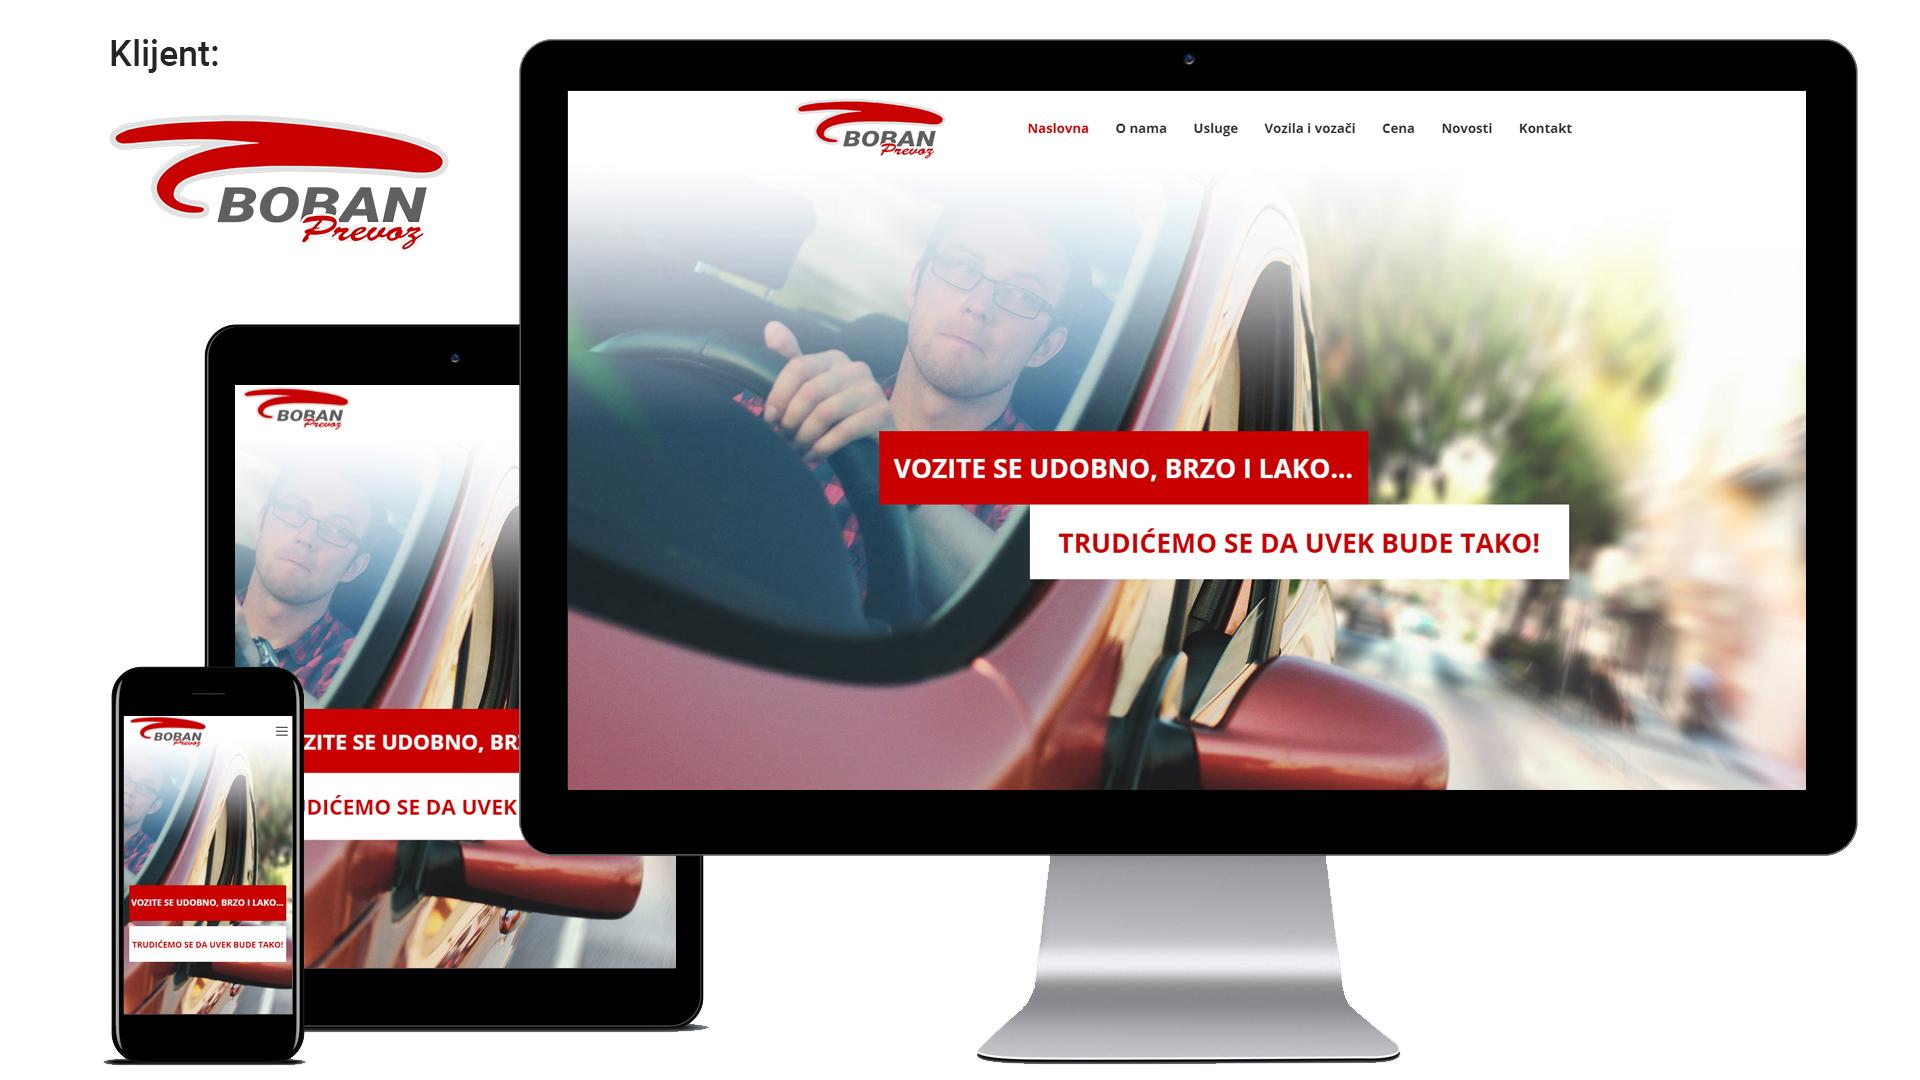 Boban prevoz - jednostavan i moderan sajt autoprevoznika